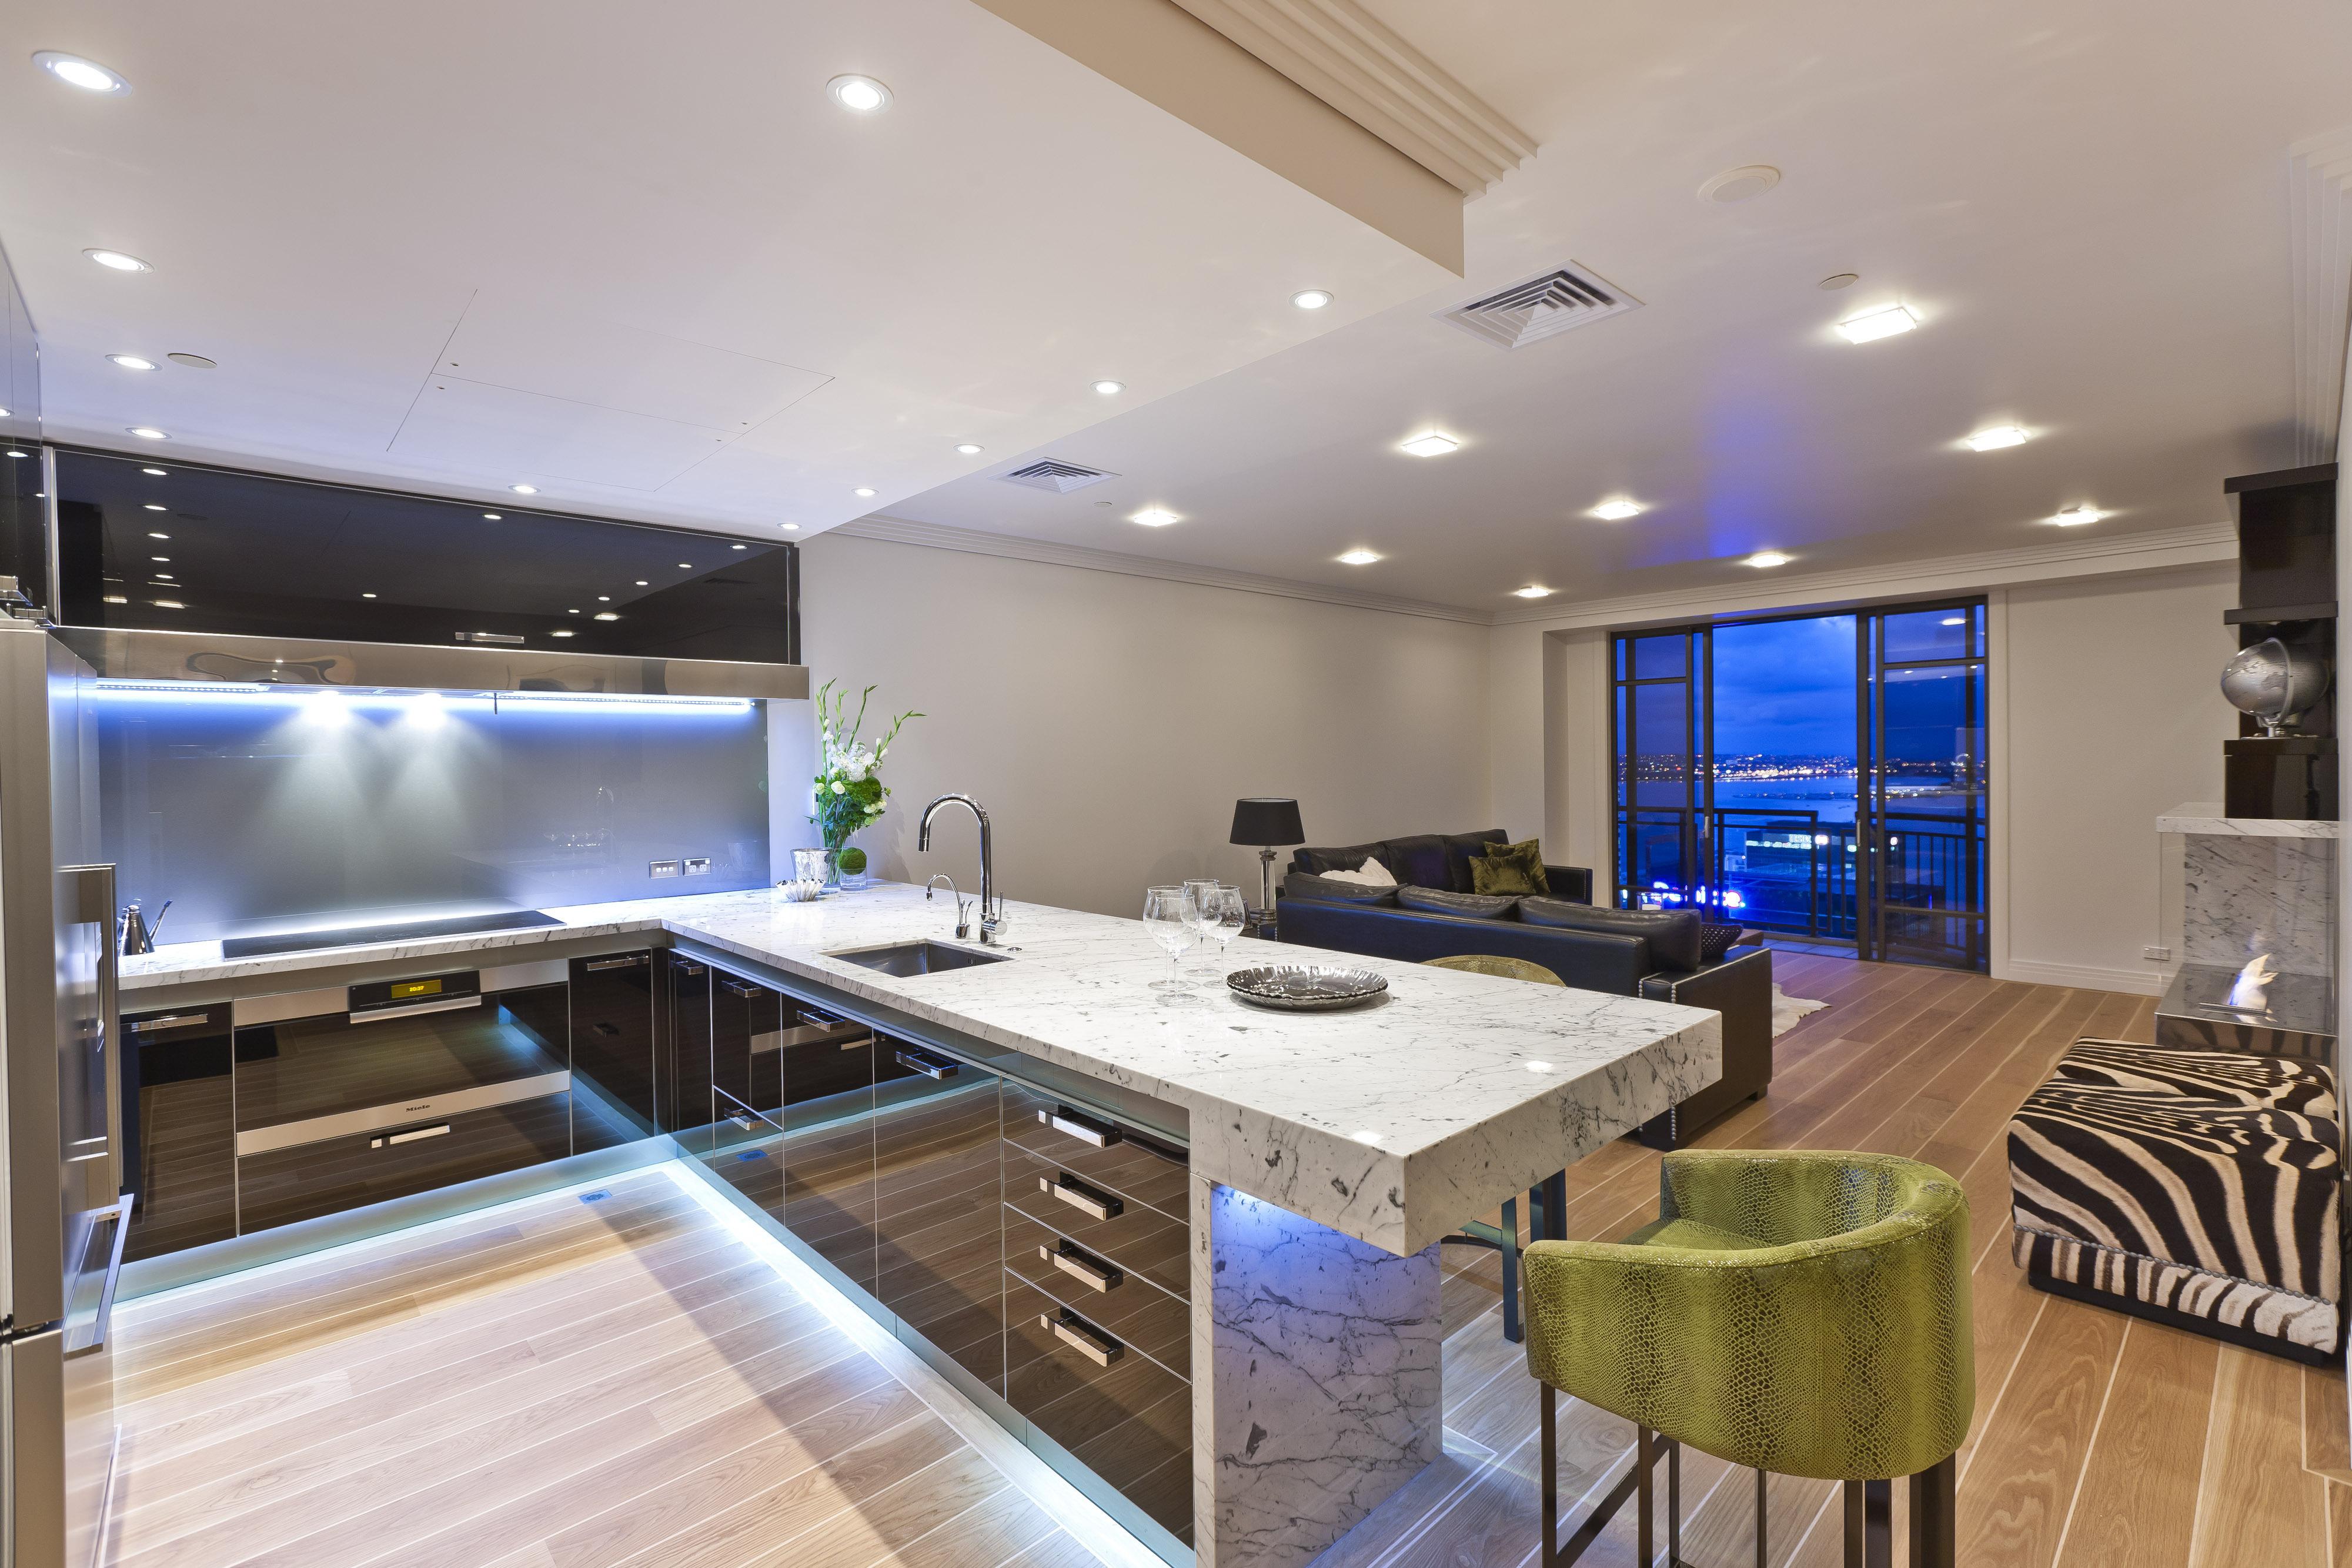 _apartment_design_with_kitchen_091052_